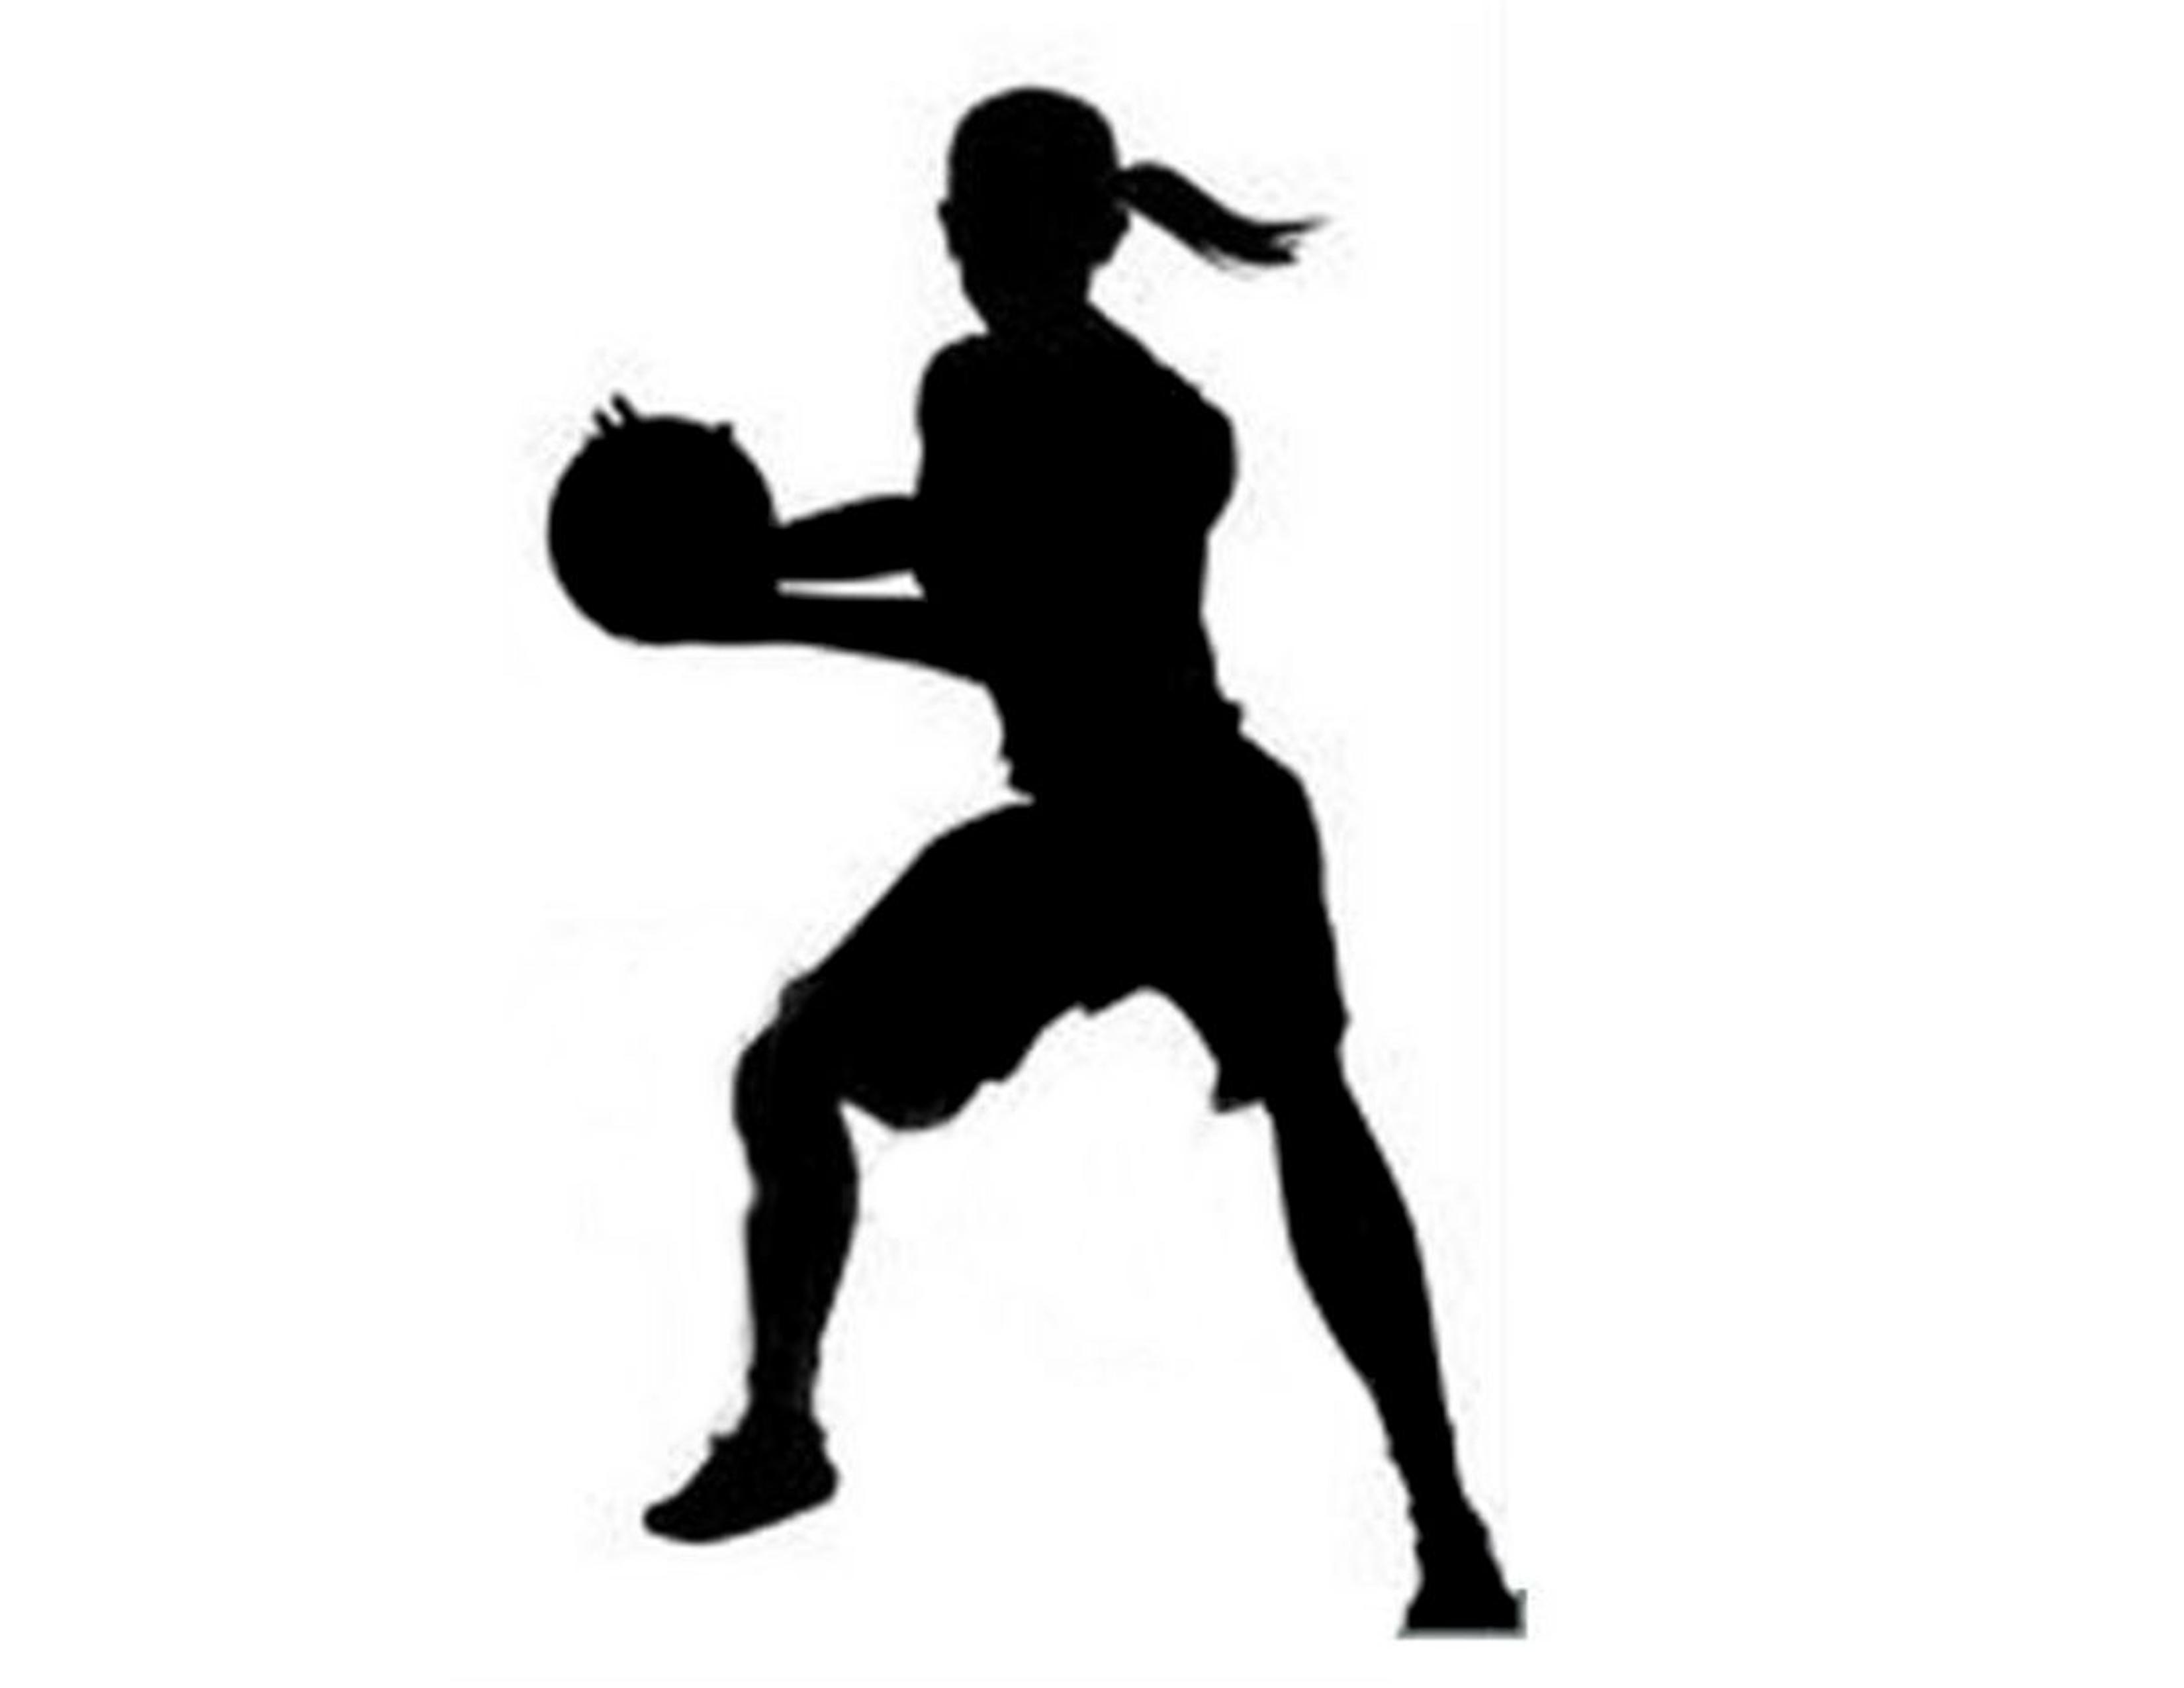 3300x2550 Girl Basketball Player Silhouette